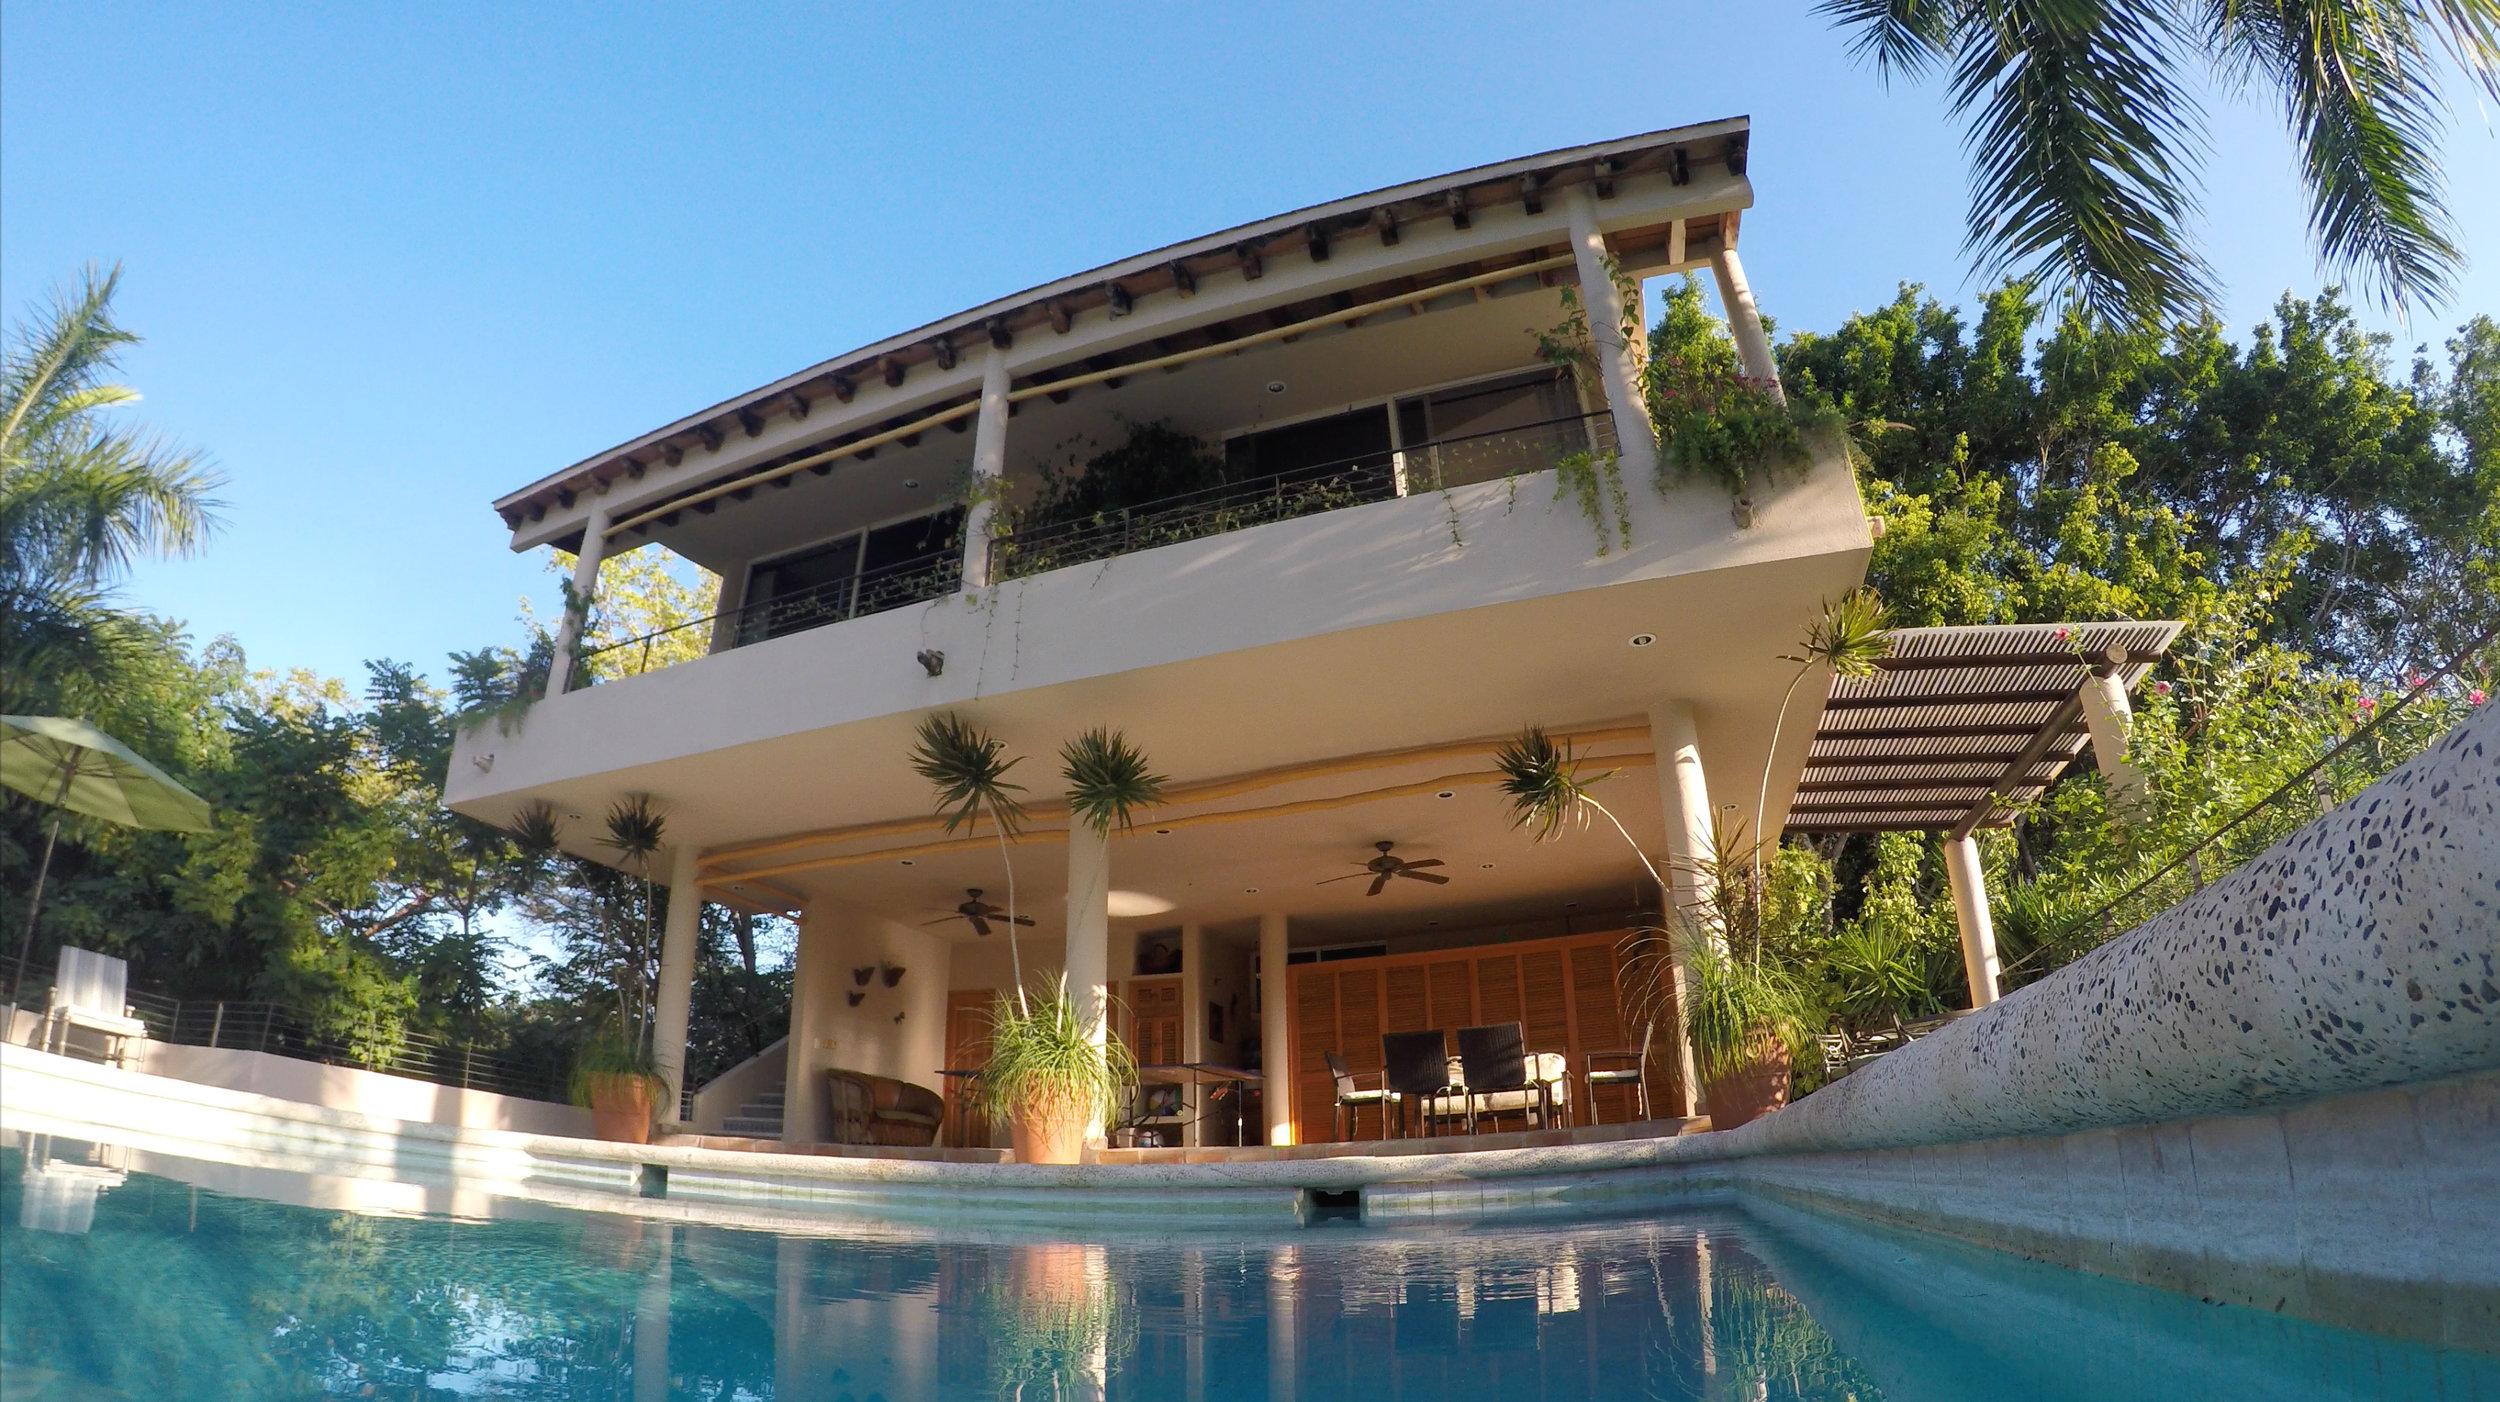 Hacienda+Alegre-10.jpg